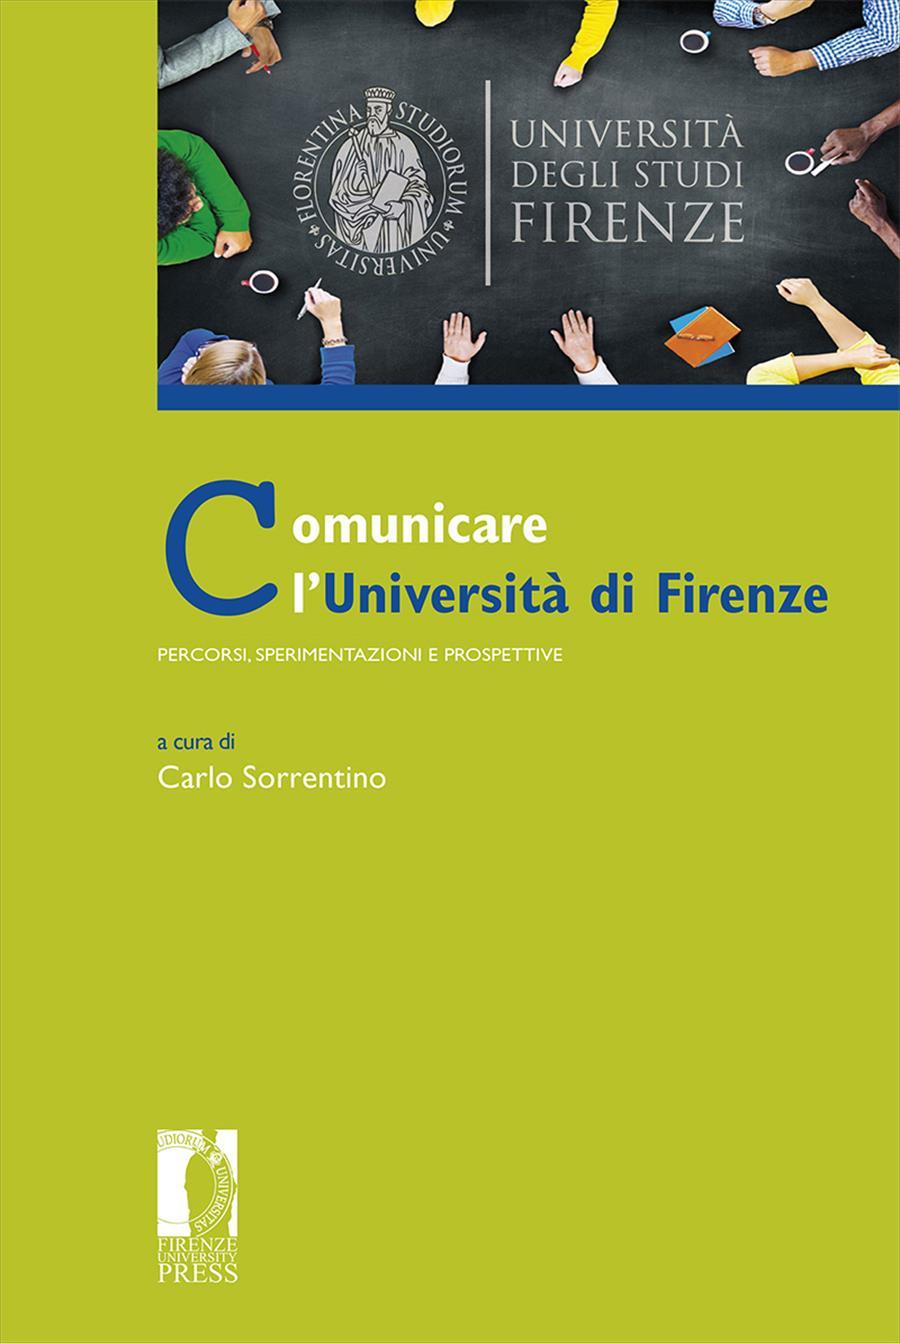 Comunicare l'Università di Firenze